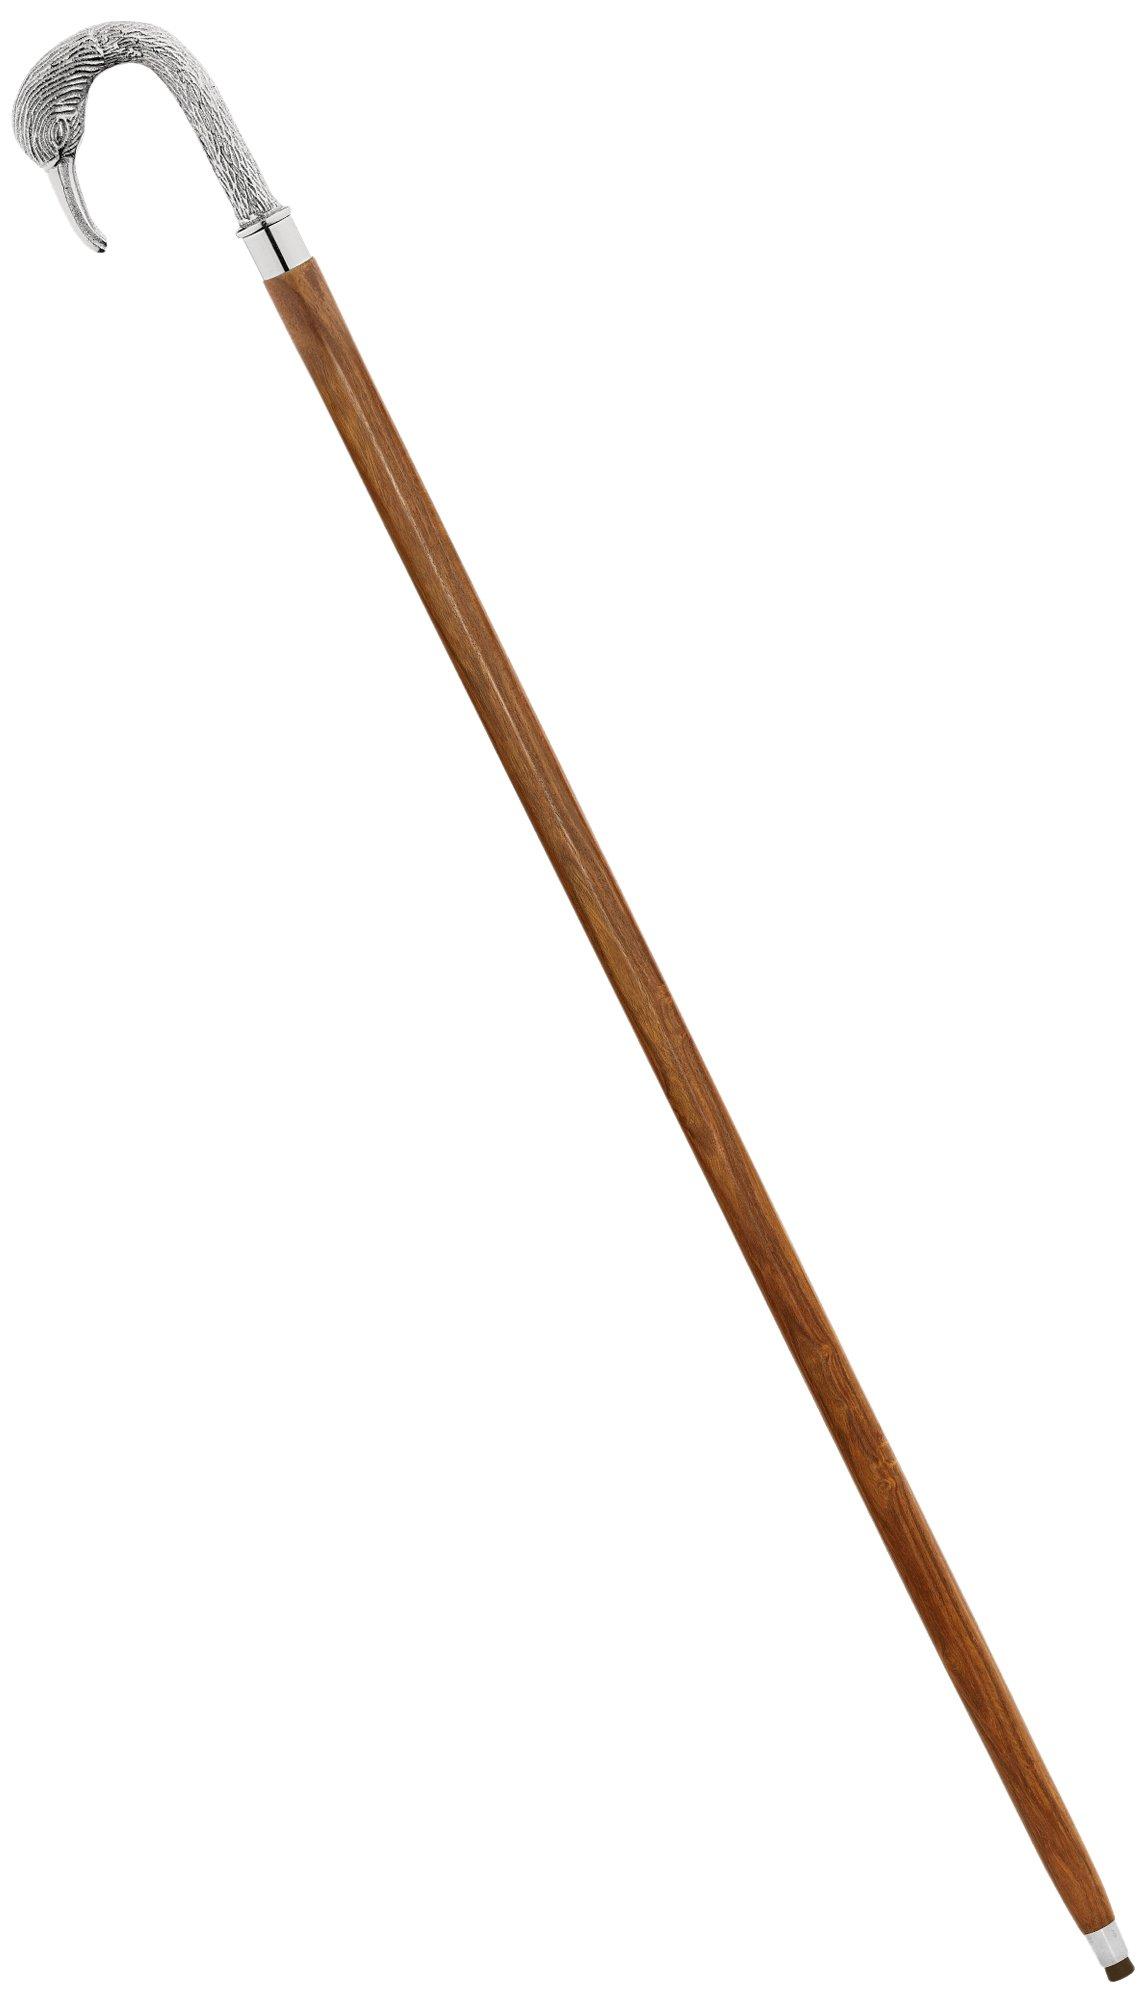 Design Toscano Empress Collection Silver Swan Chrome Solid Hardwood Walking Stick